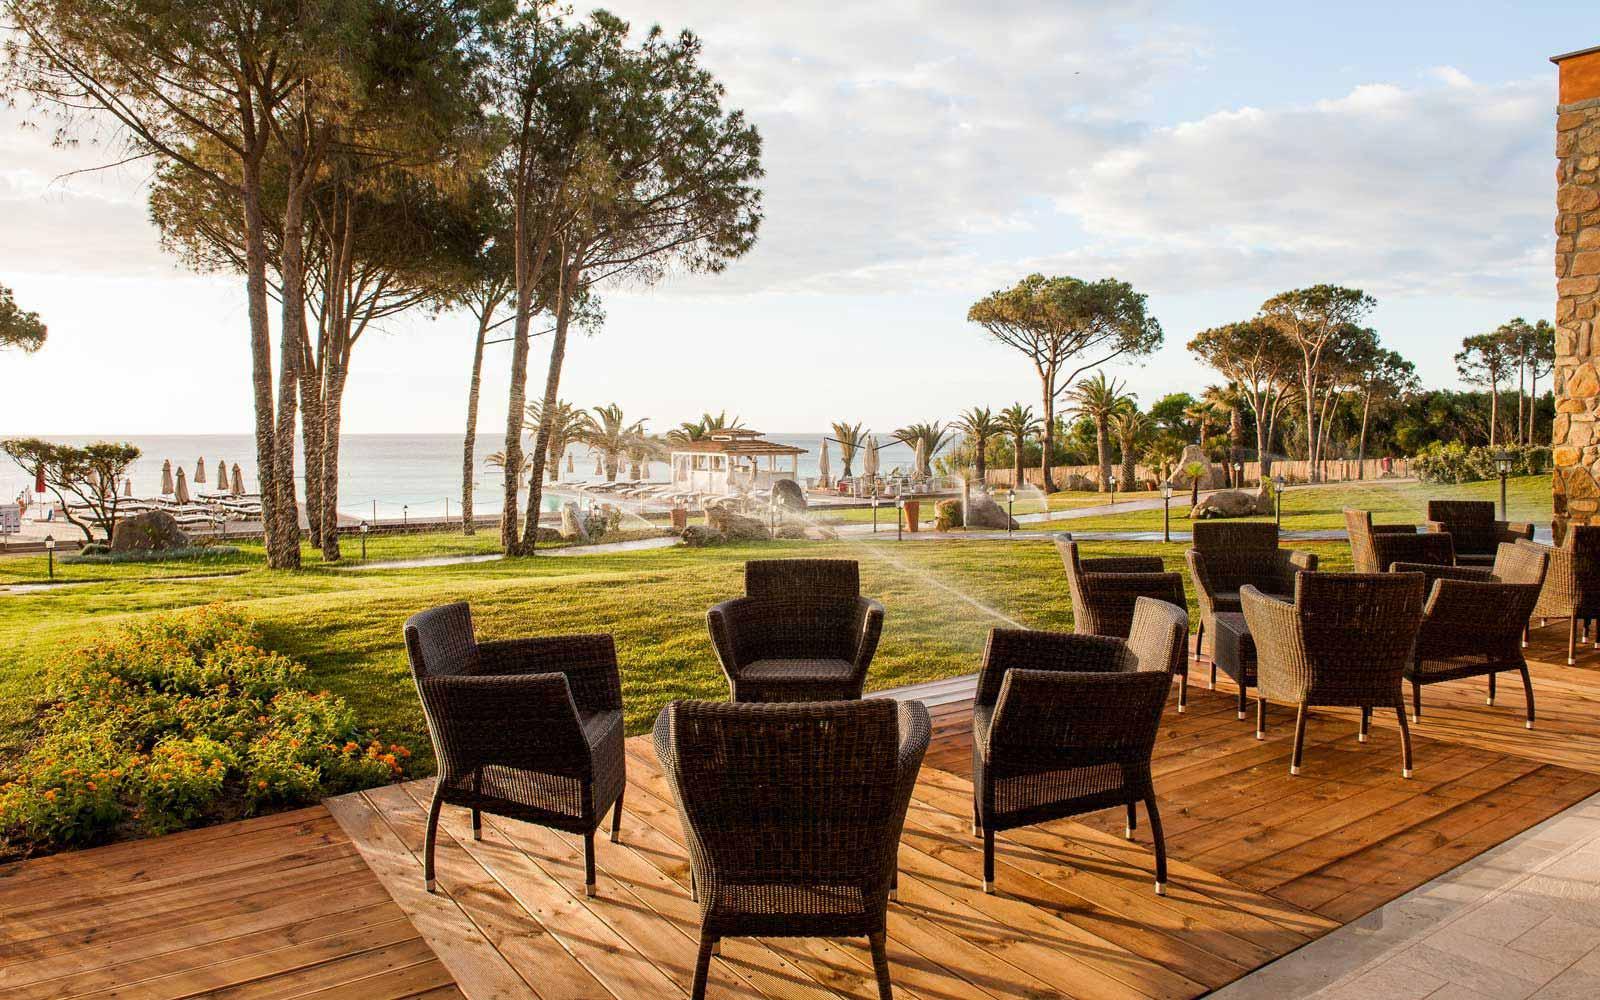 Garden Bar at the Hotel Villa del Re